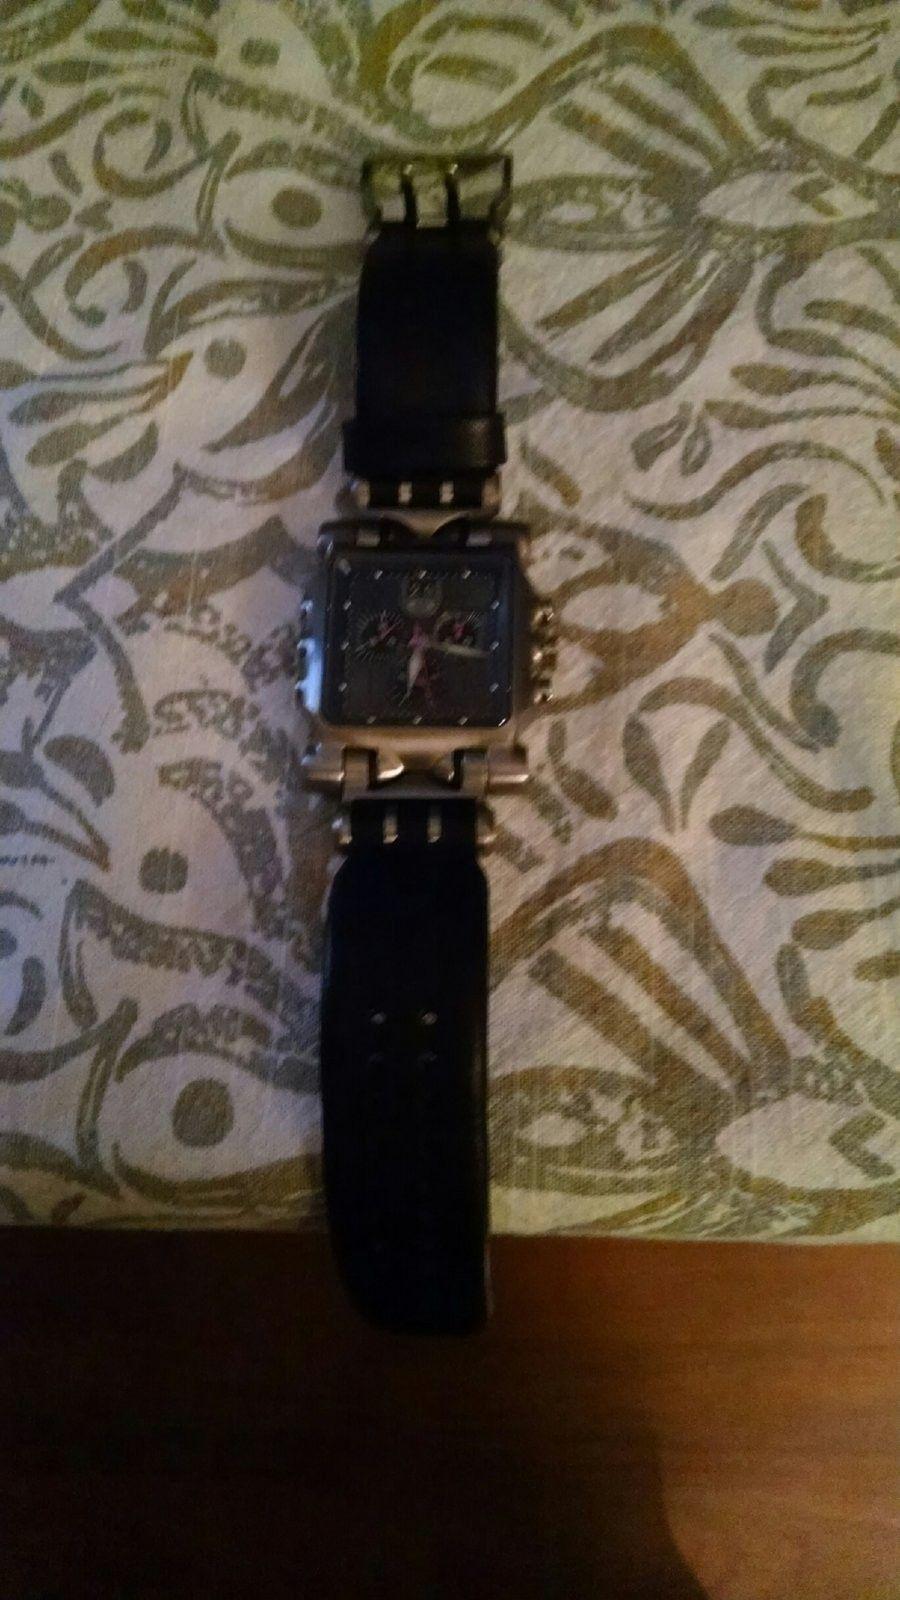 Minute machine w/ black leather - image.jpeg